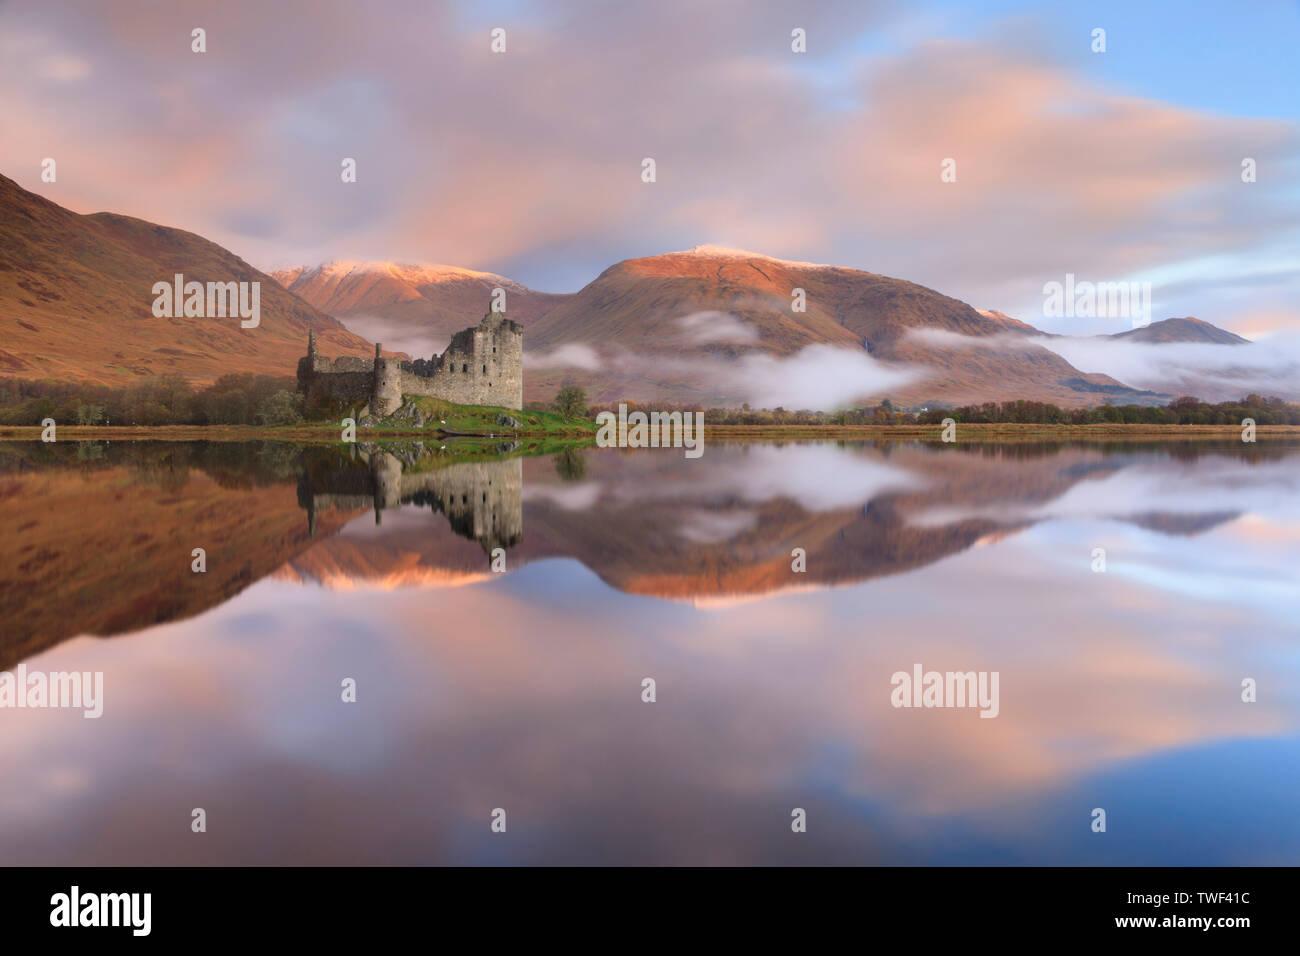 Kilchurn Castle on Loch Awe captured at sunrise. - Stock Image